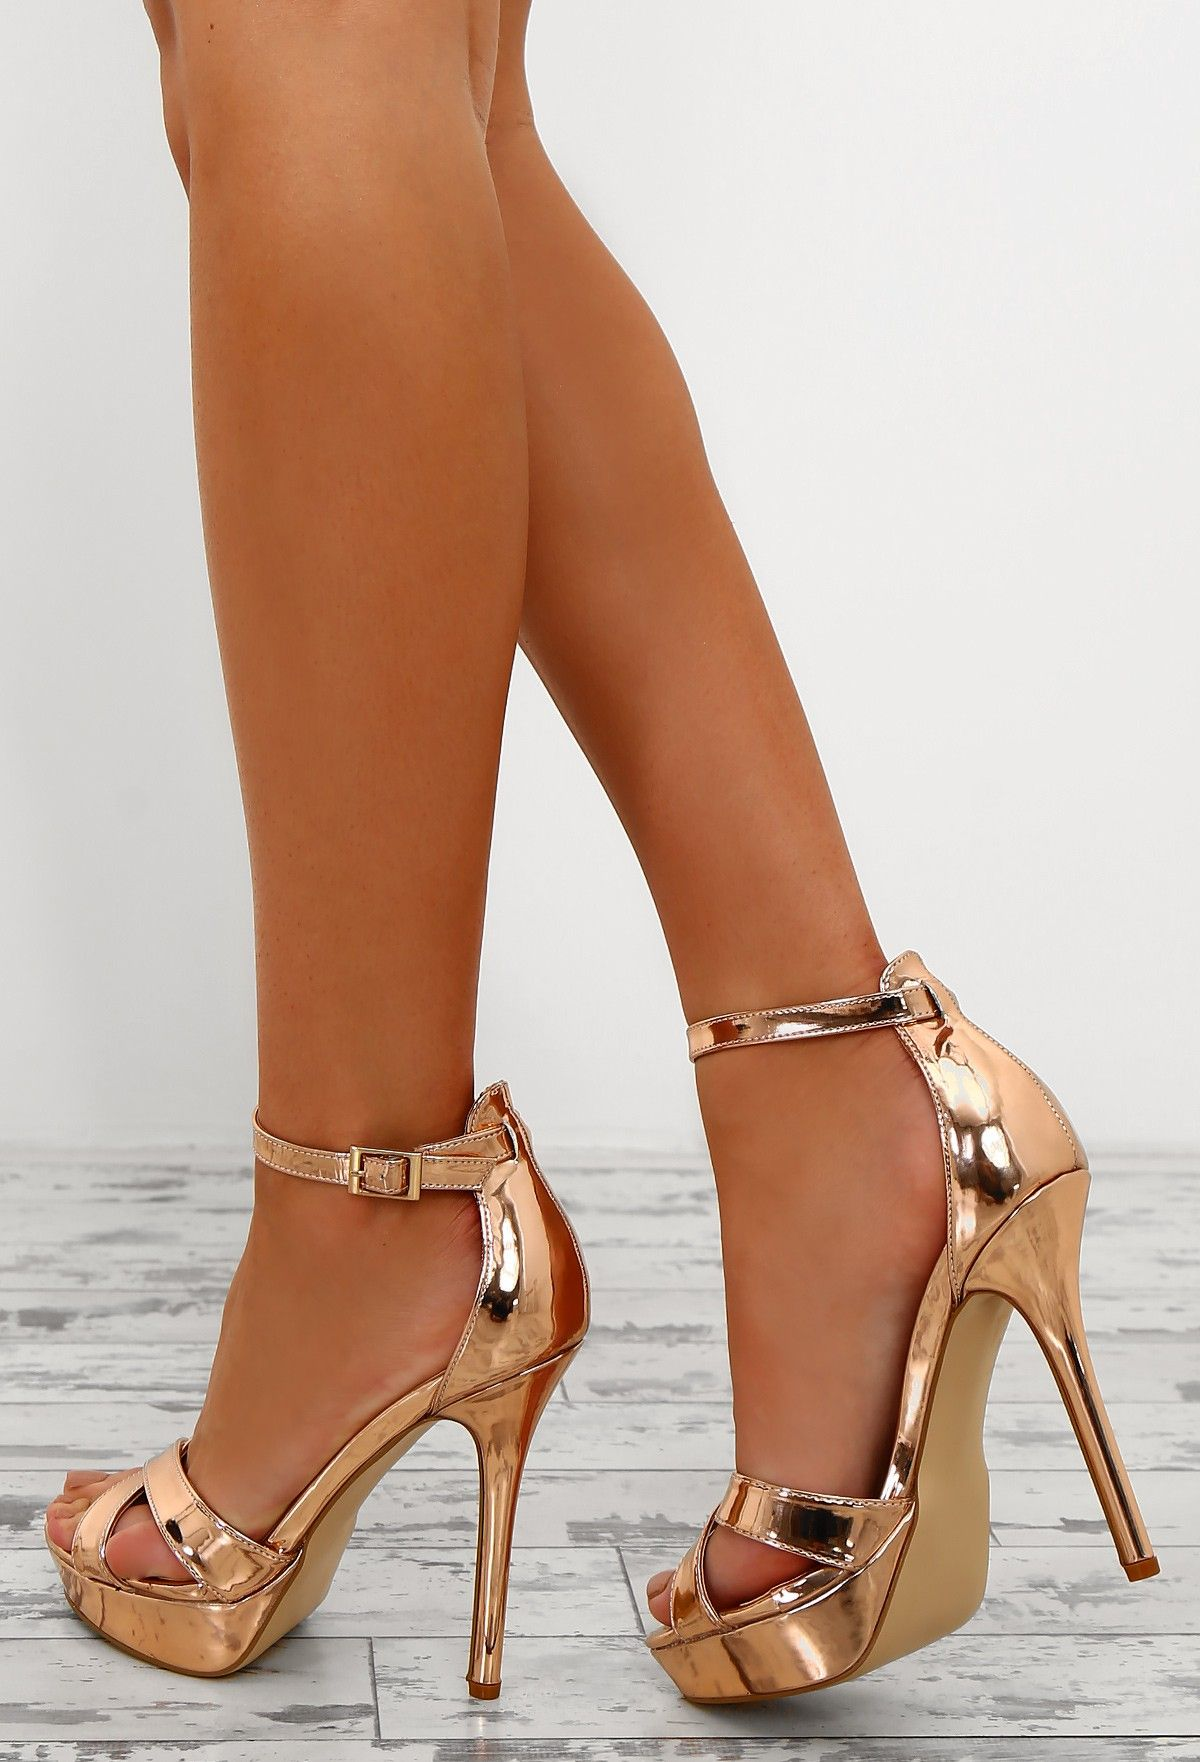 Pink Boutique - Celeb Inspired Fashion & Dresses. Game of Chromes Rose Gold Peep  Toe Platform Heels